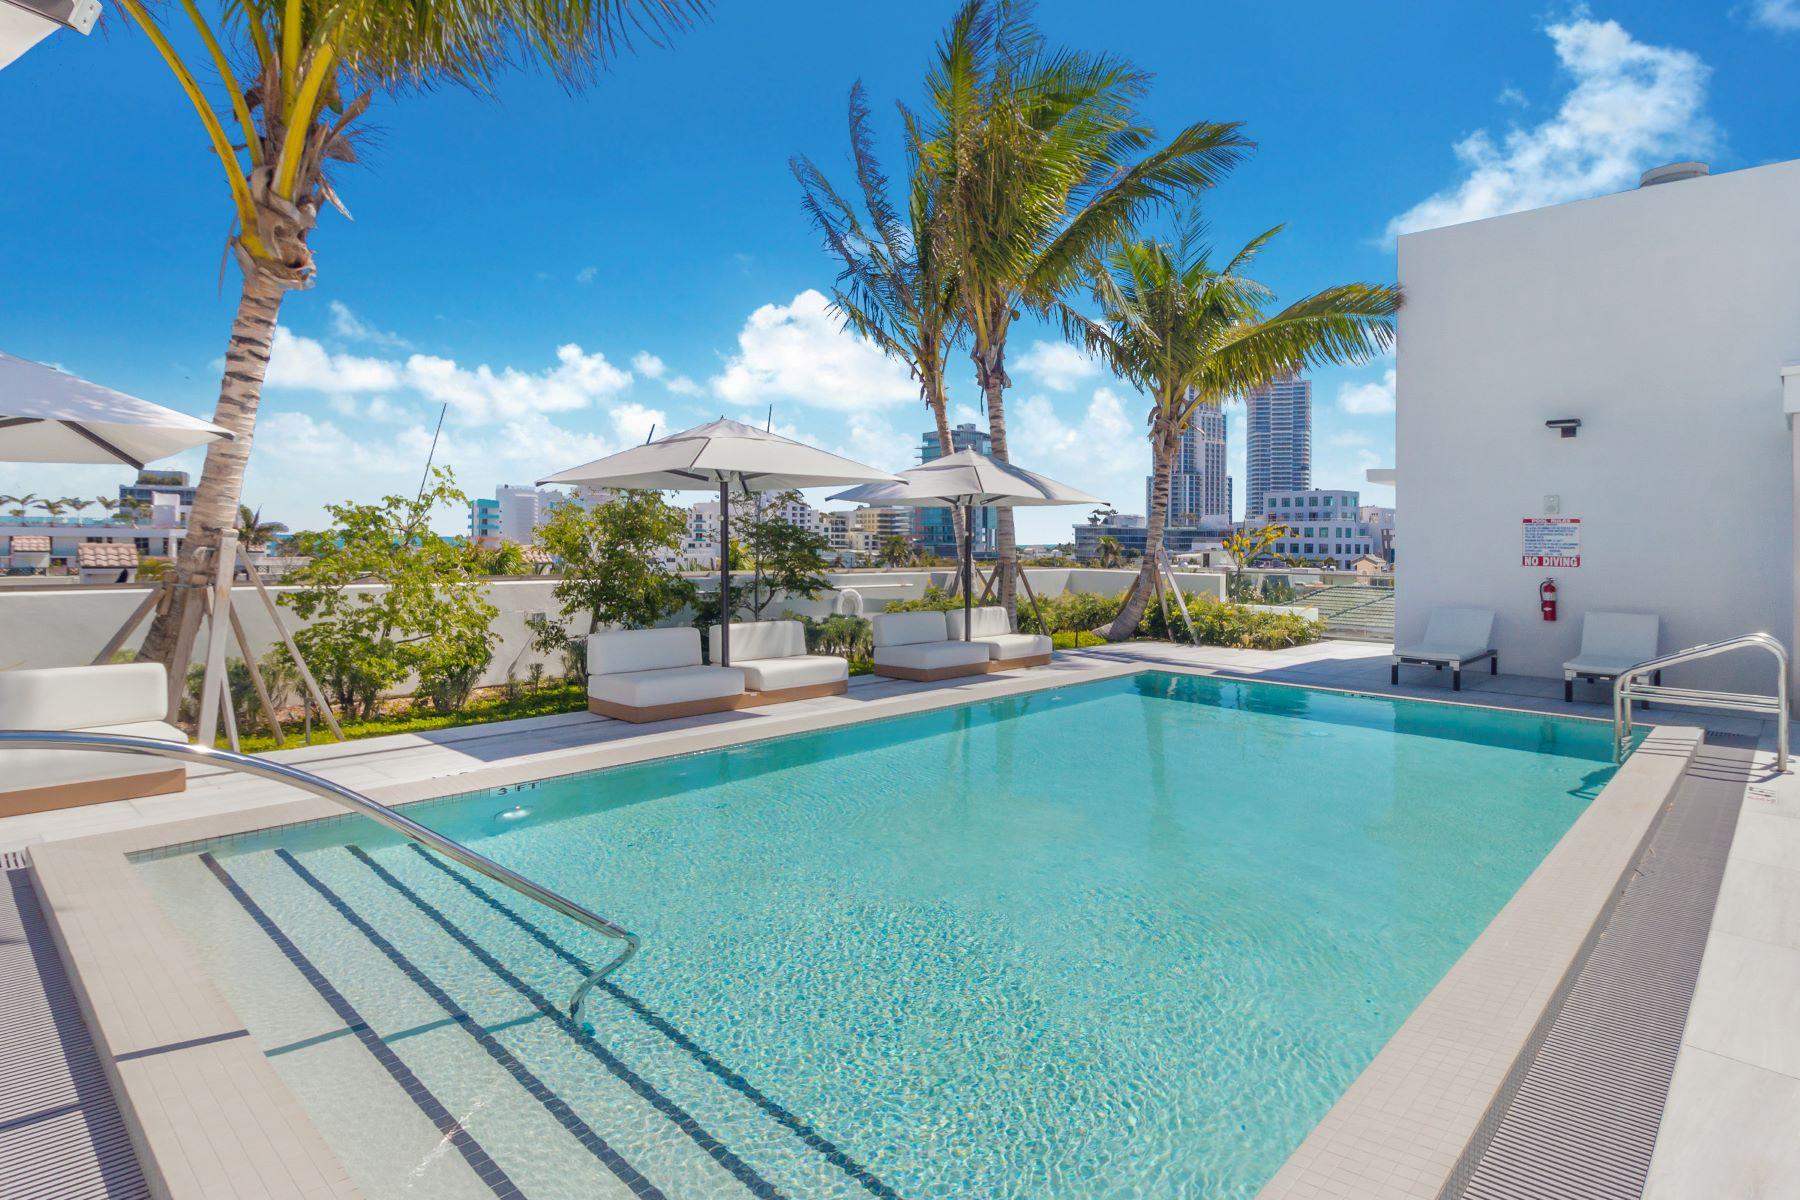 Condominium for Sale at 311 Meridian Ave 311 Meridian Ave 303, Miami Beach, Florida, 33139 United States